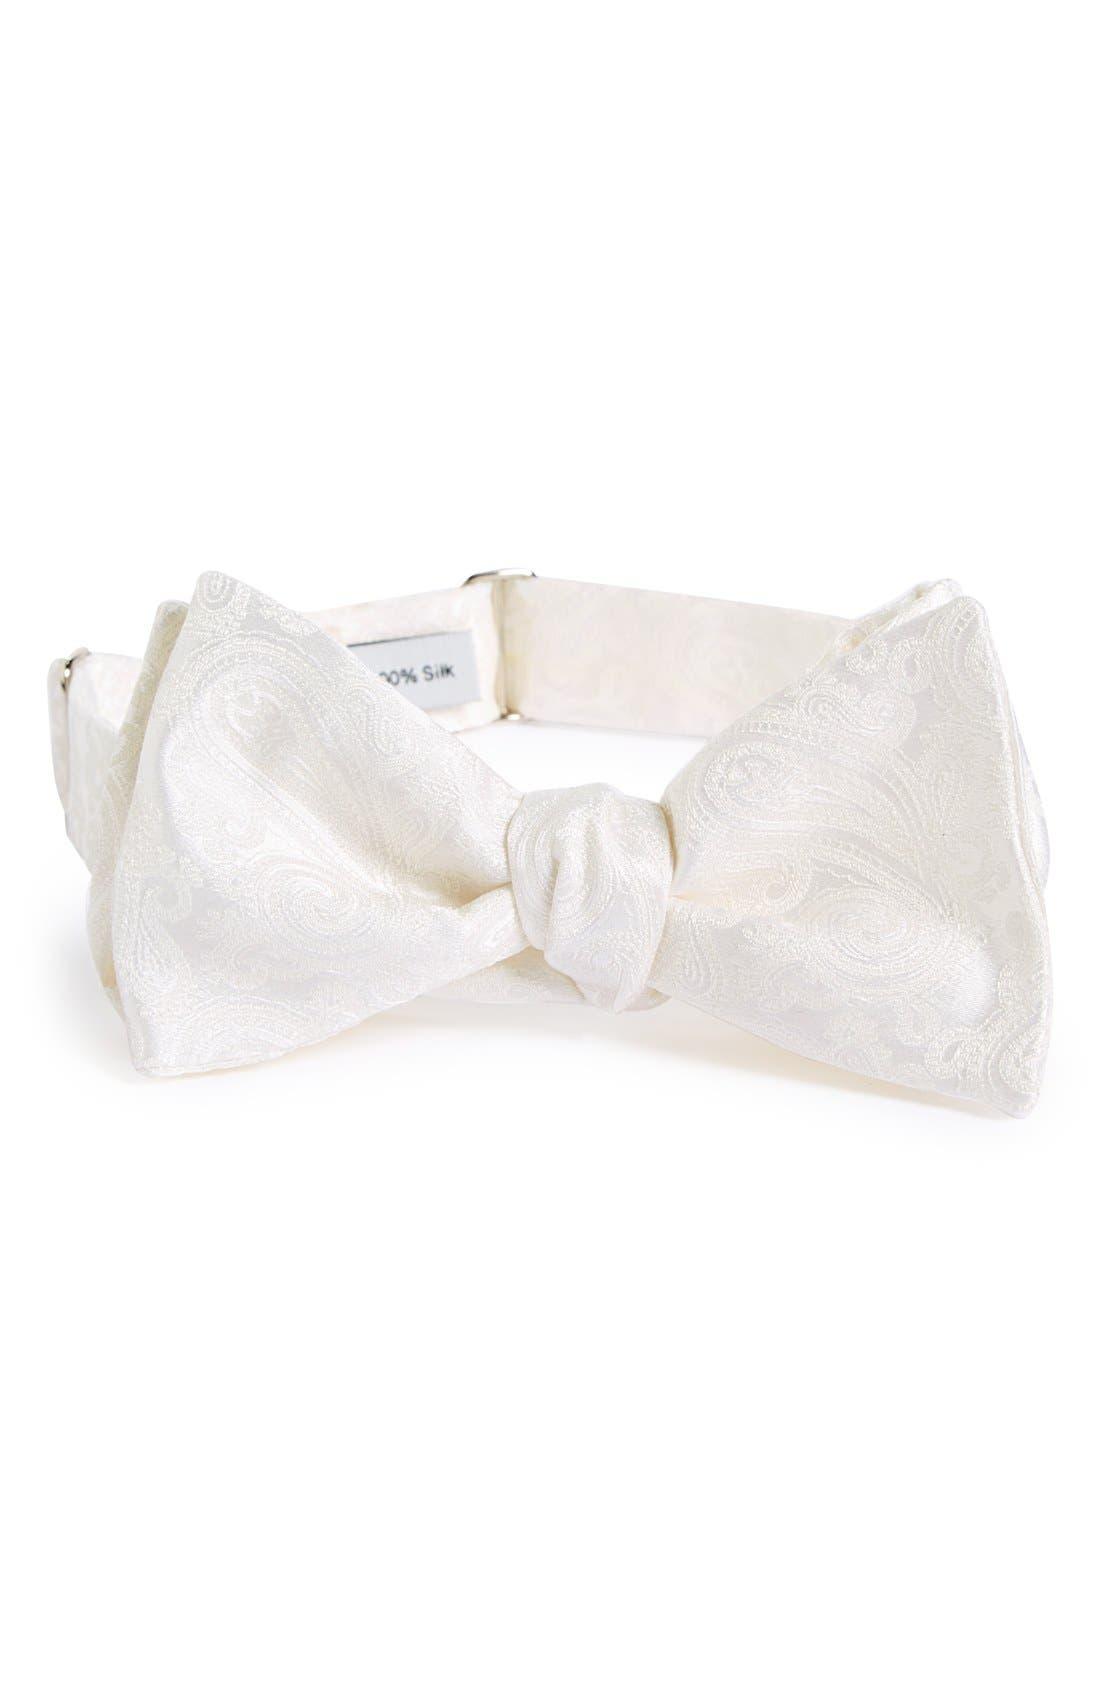 Paisley Silk Bow Tie,                             Main thumbnail 1, color,                             White